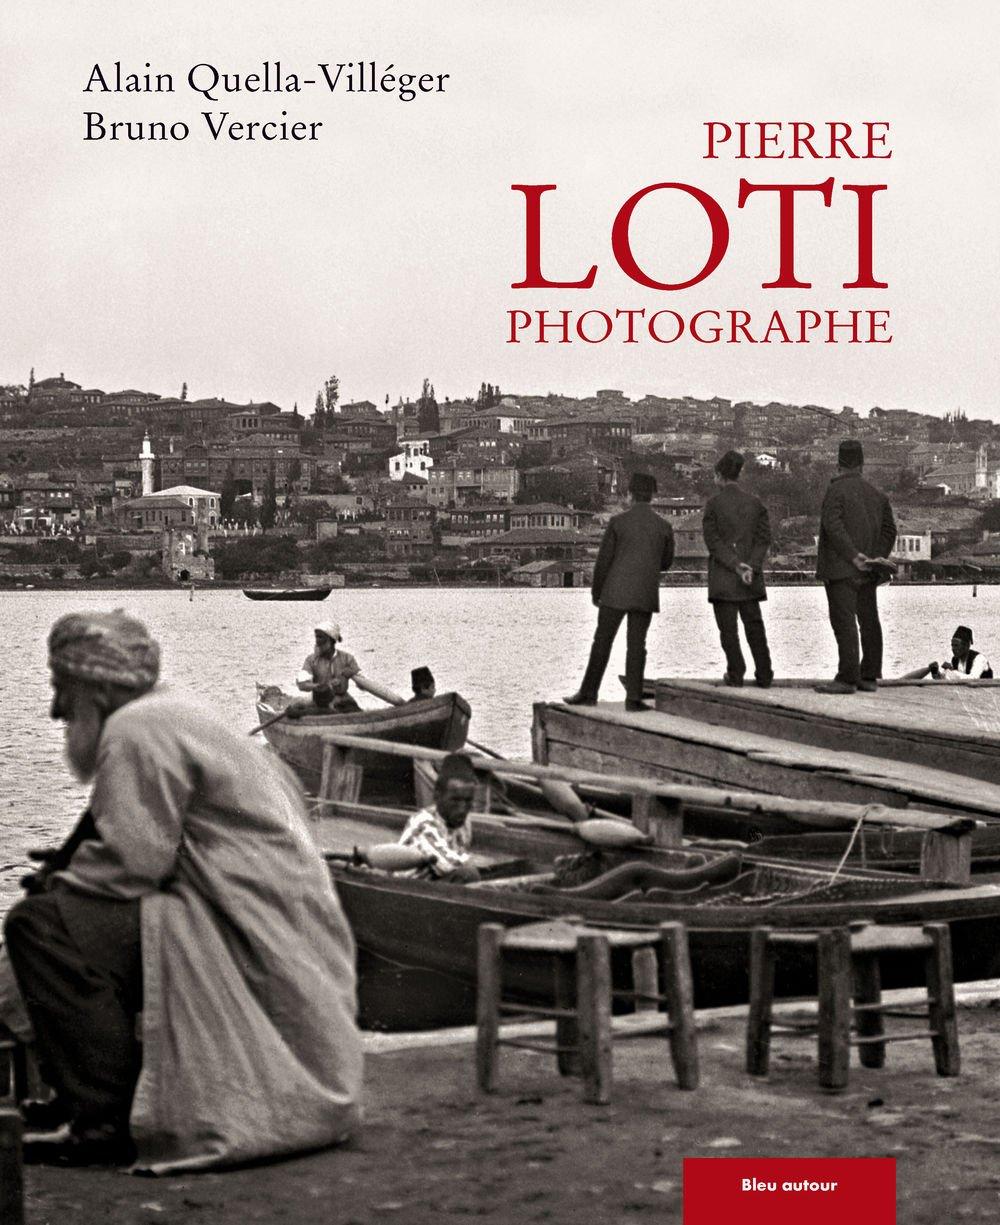 Pierre Loti photographe : Quella-Villéger, Alain, Vercier, Bruno: Amazon.it: Libri